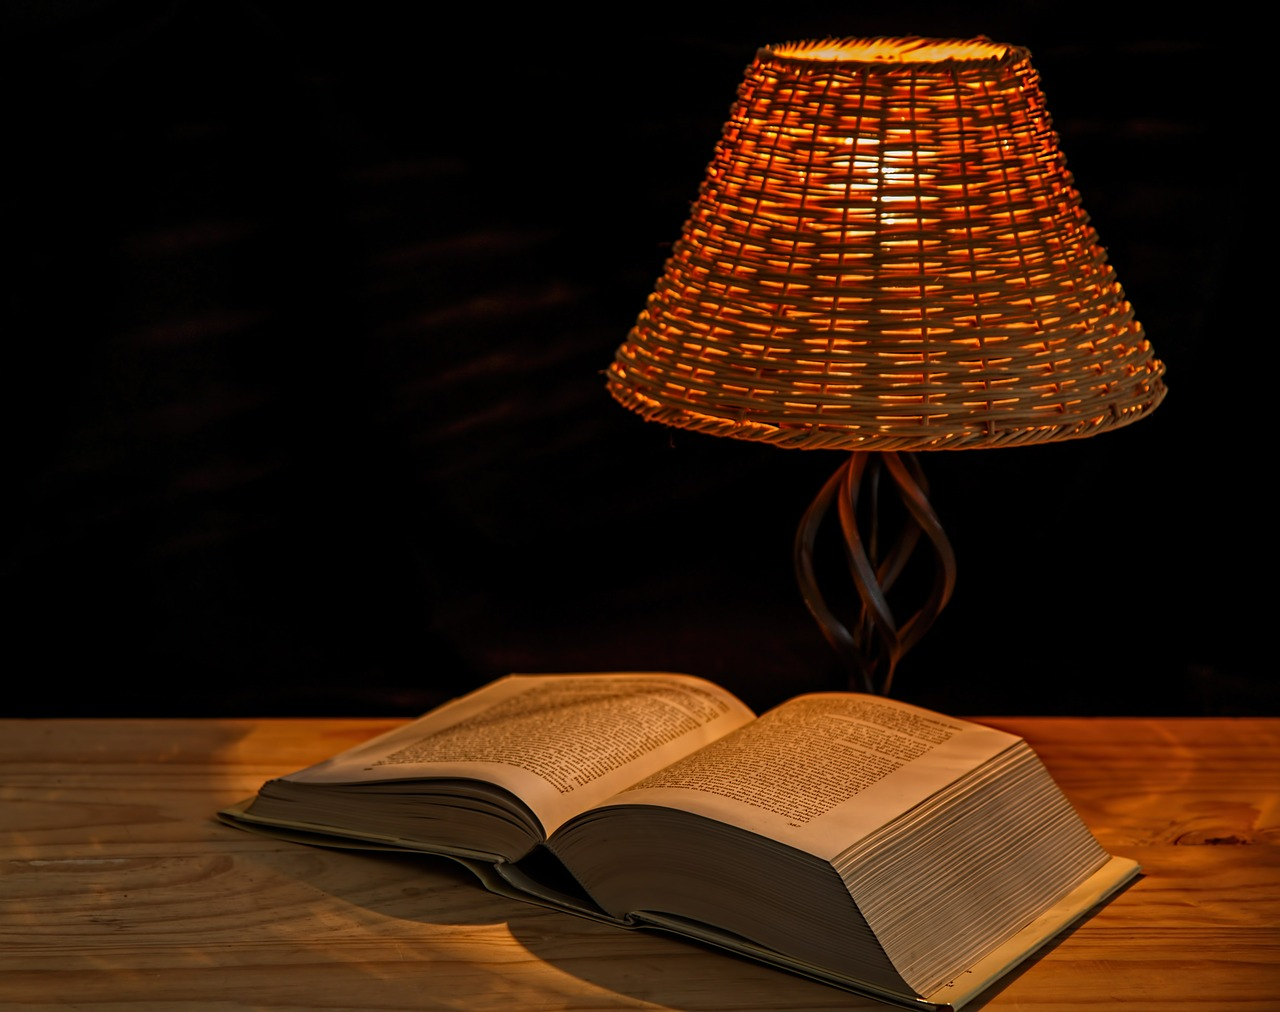 booklight-465350_1280